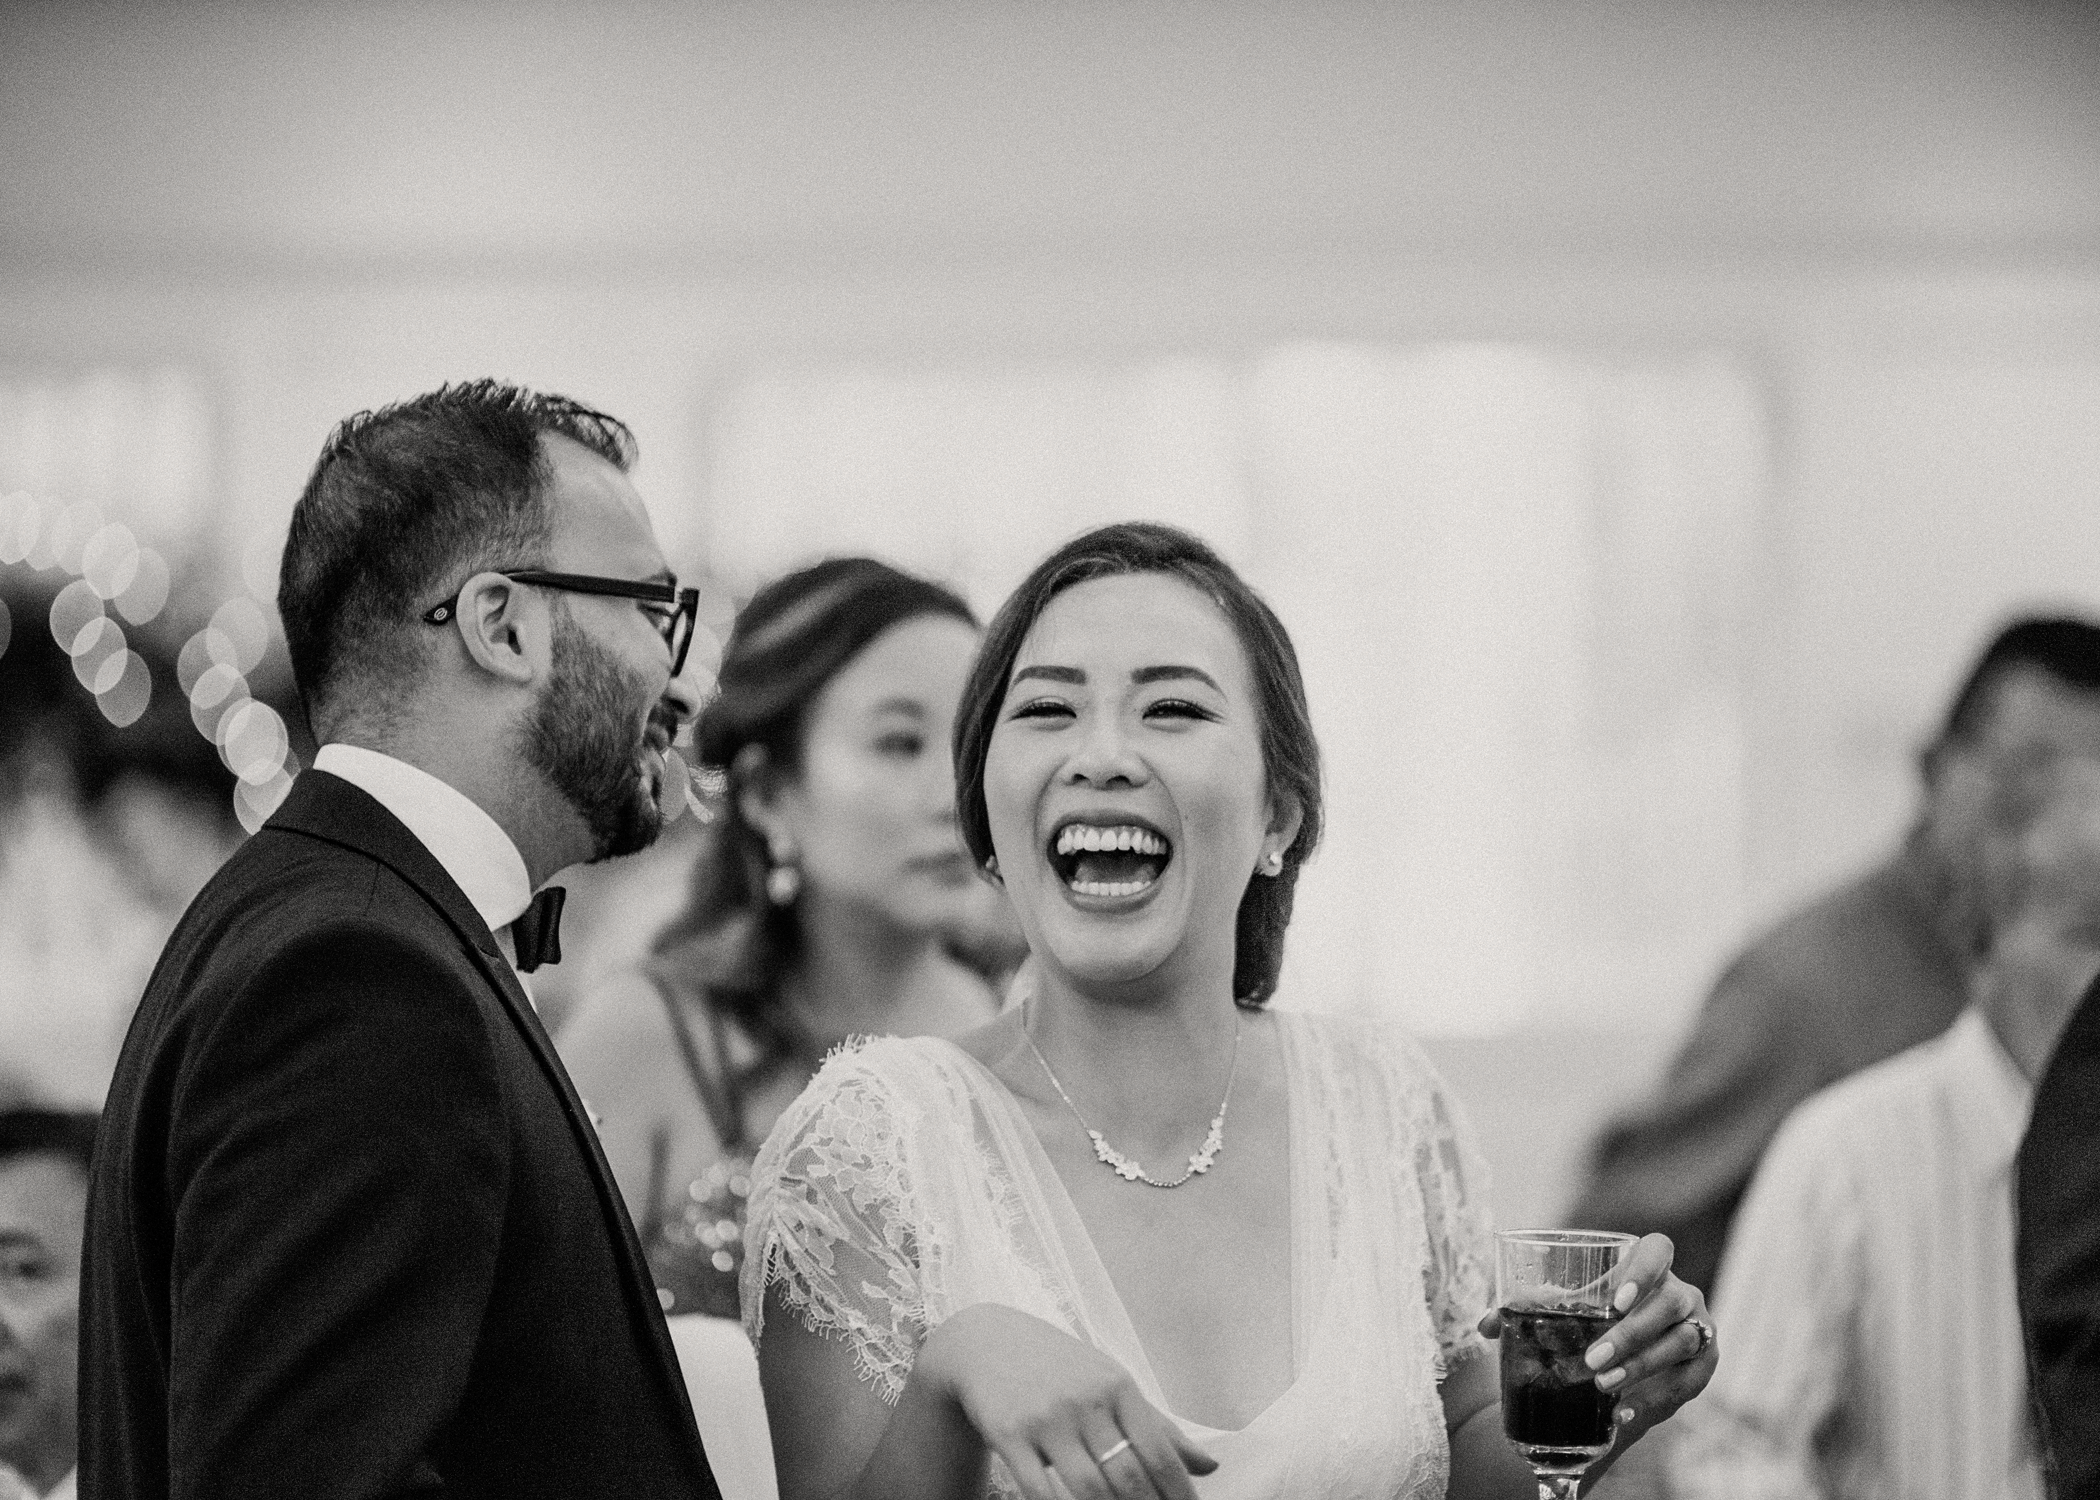 043-kaoverii-silva-pt-wedding-vancouver-photography.png